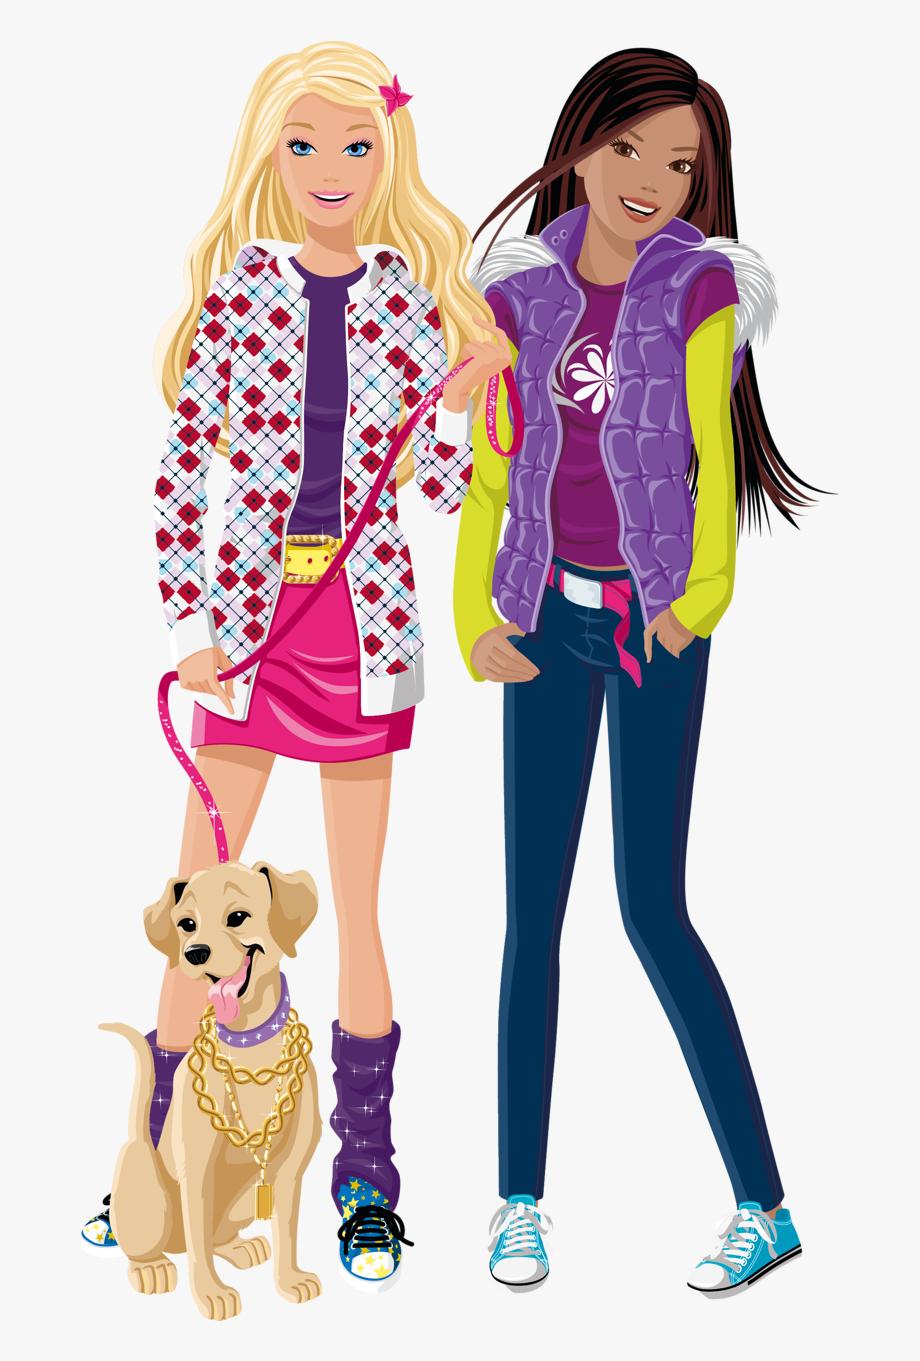 Barbie clipart carton. And friend image